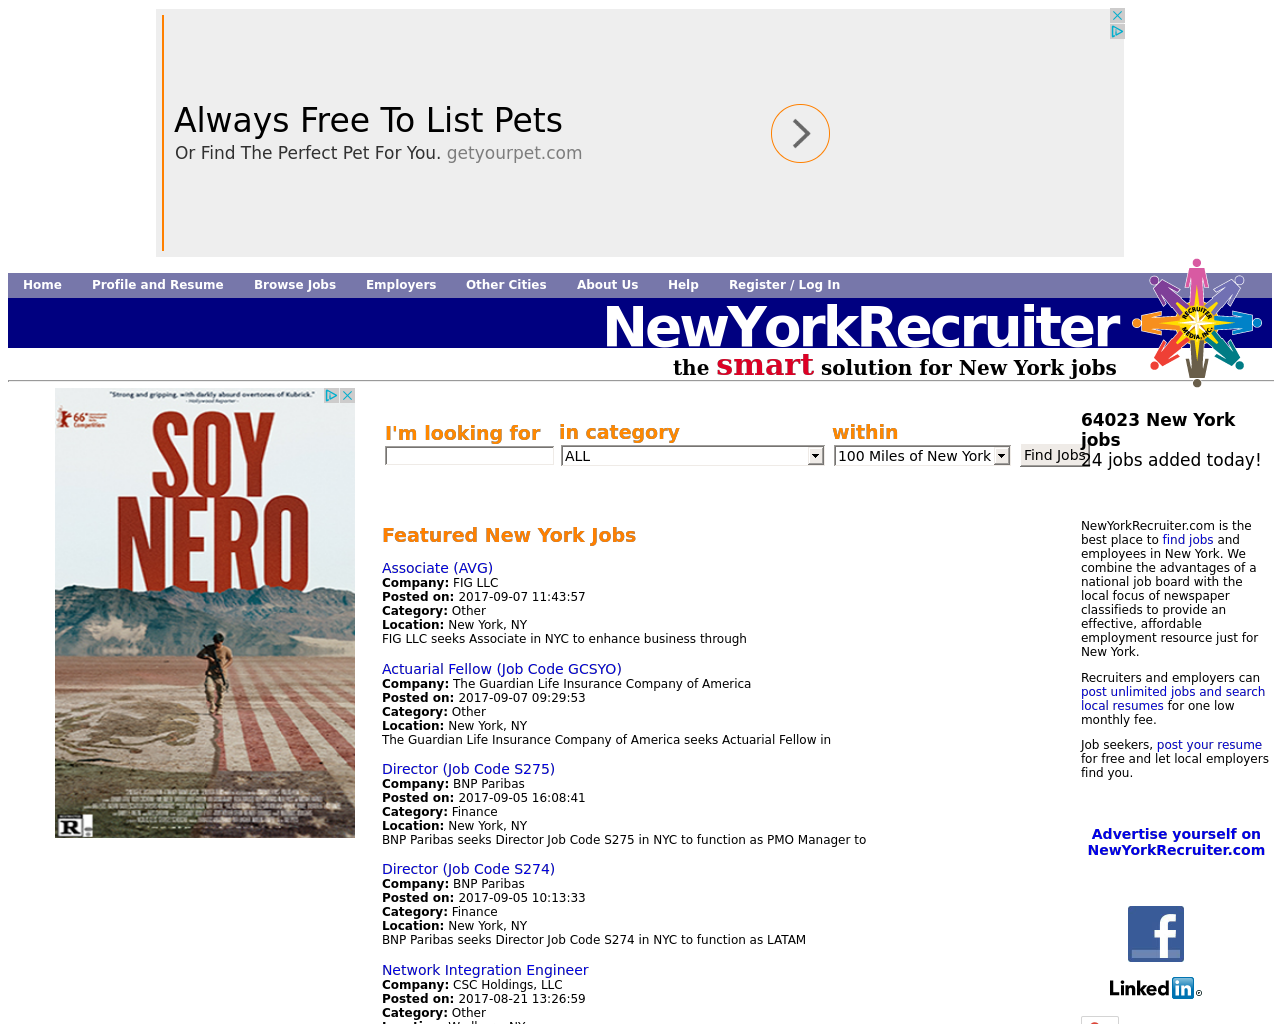 NewYorkRecruiter-Advertising-Reviews-Pricing